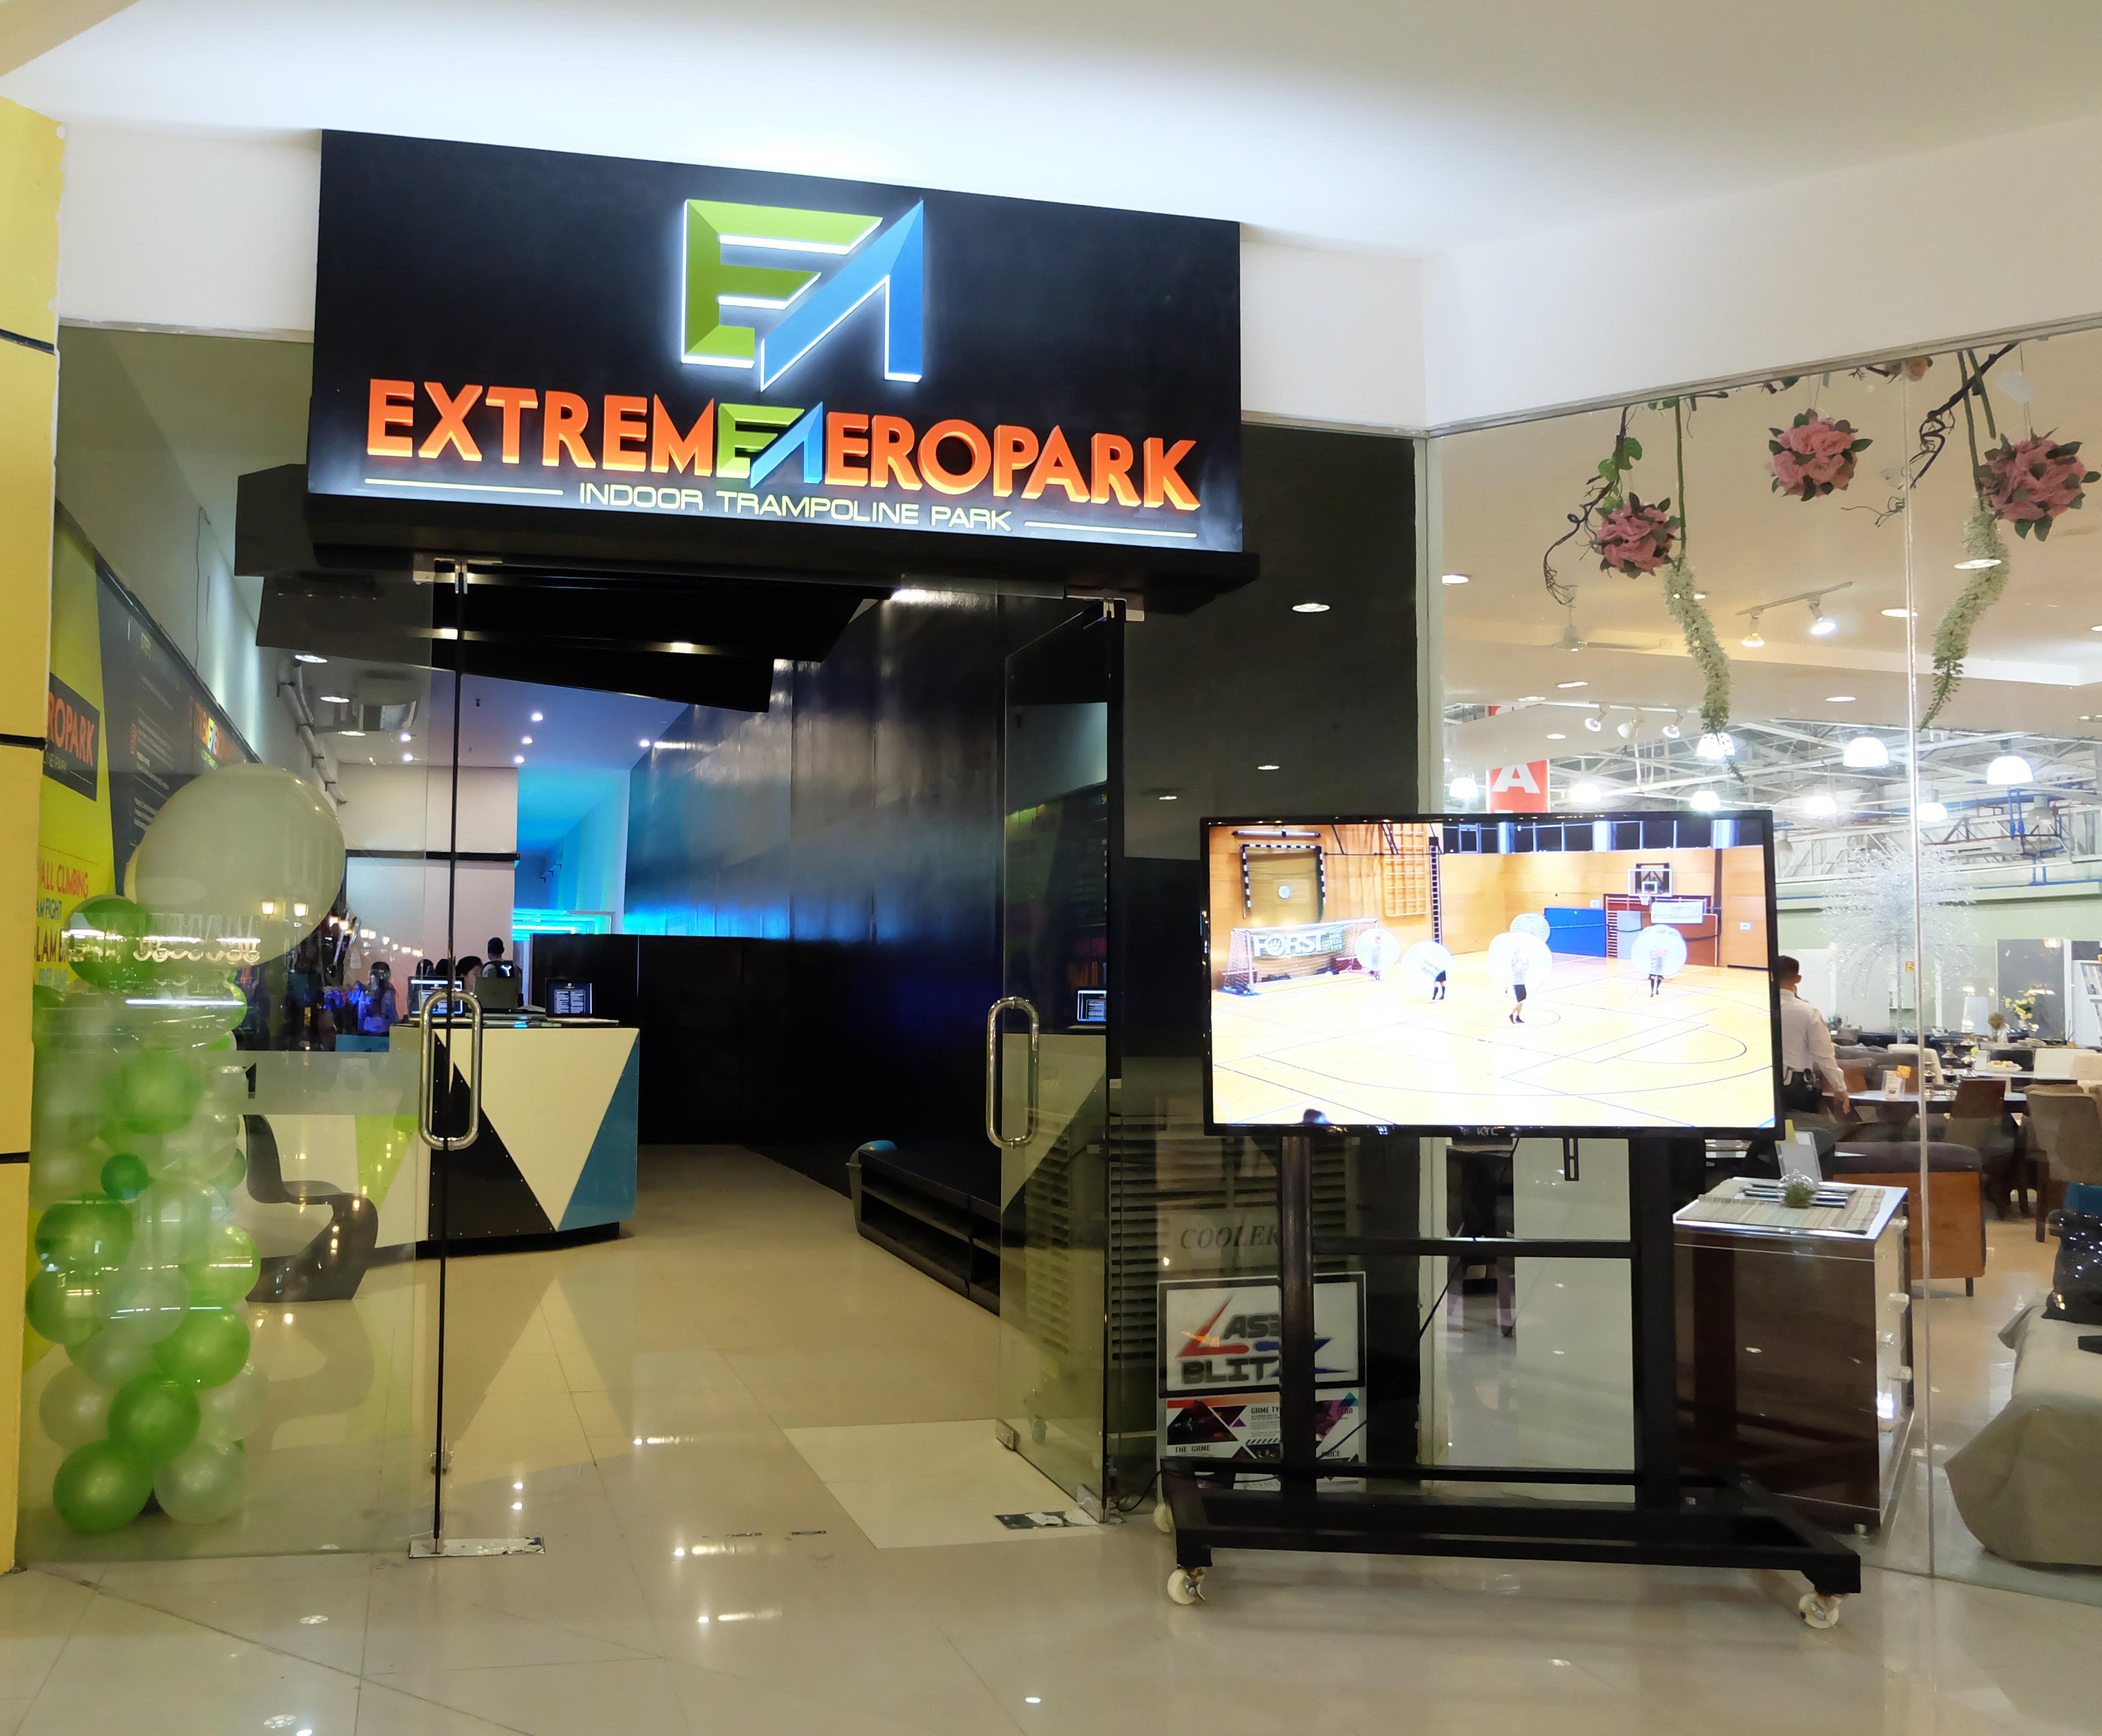 Extreme Aeropark Indoor Trampoline Park @ Parkmall, Cebu